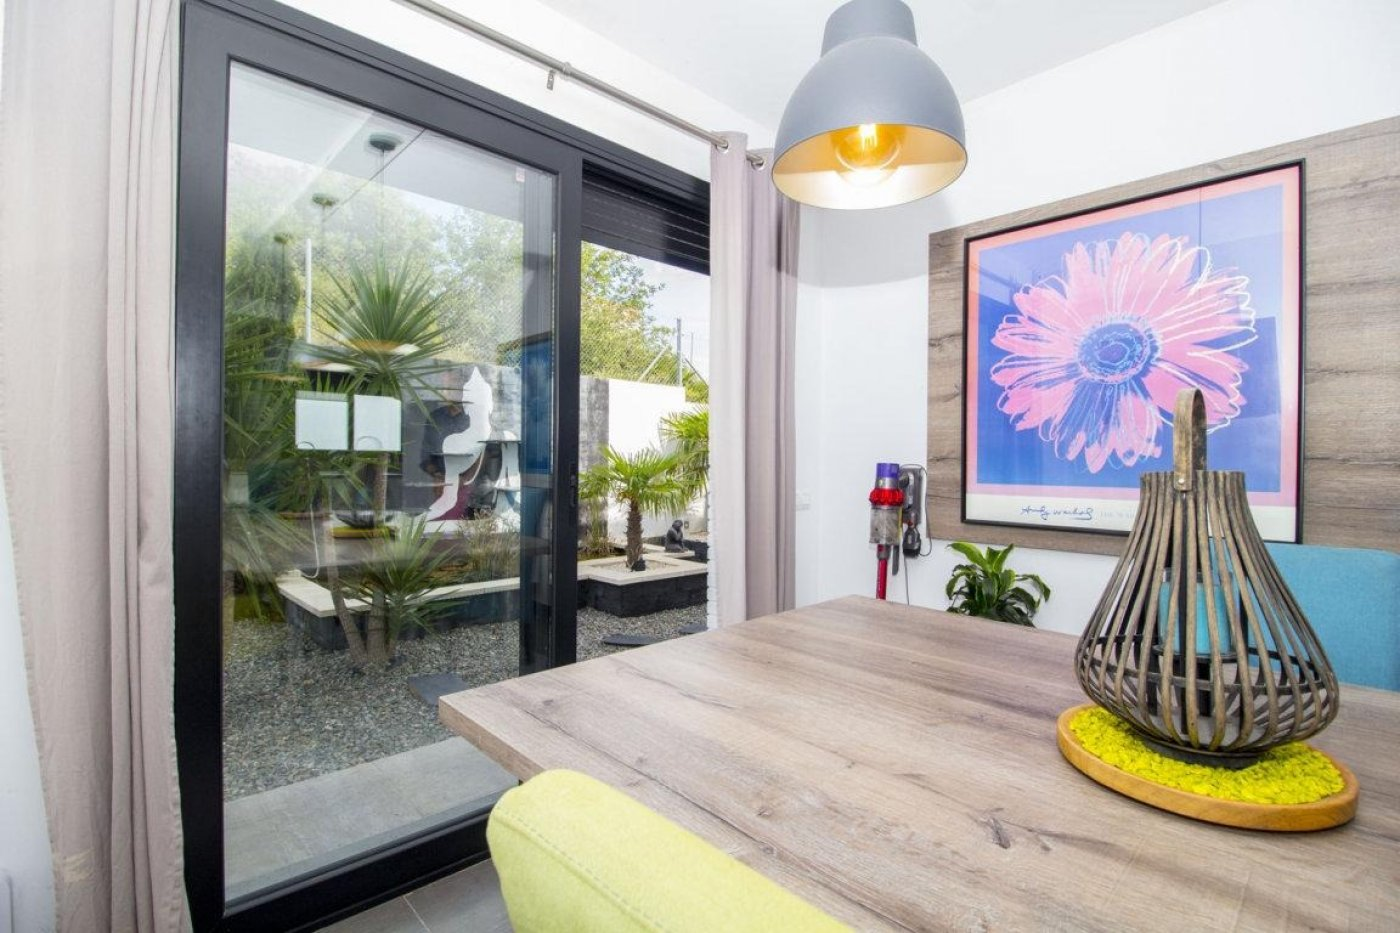 Casa exclusiva con piscina - imagenInmueble19